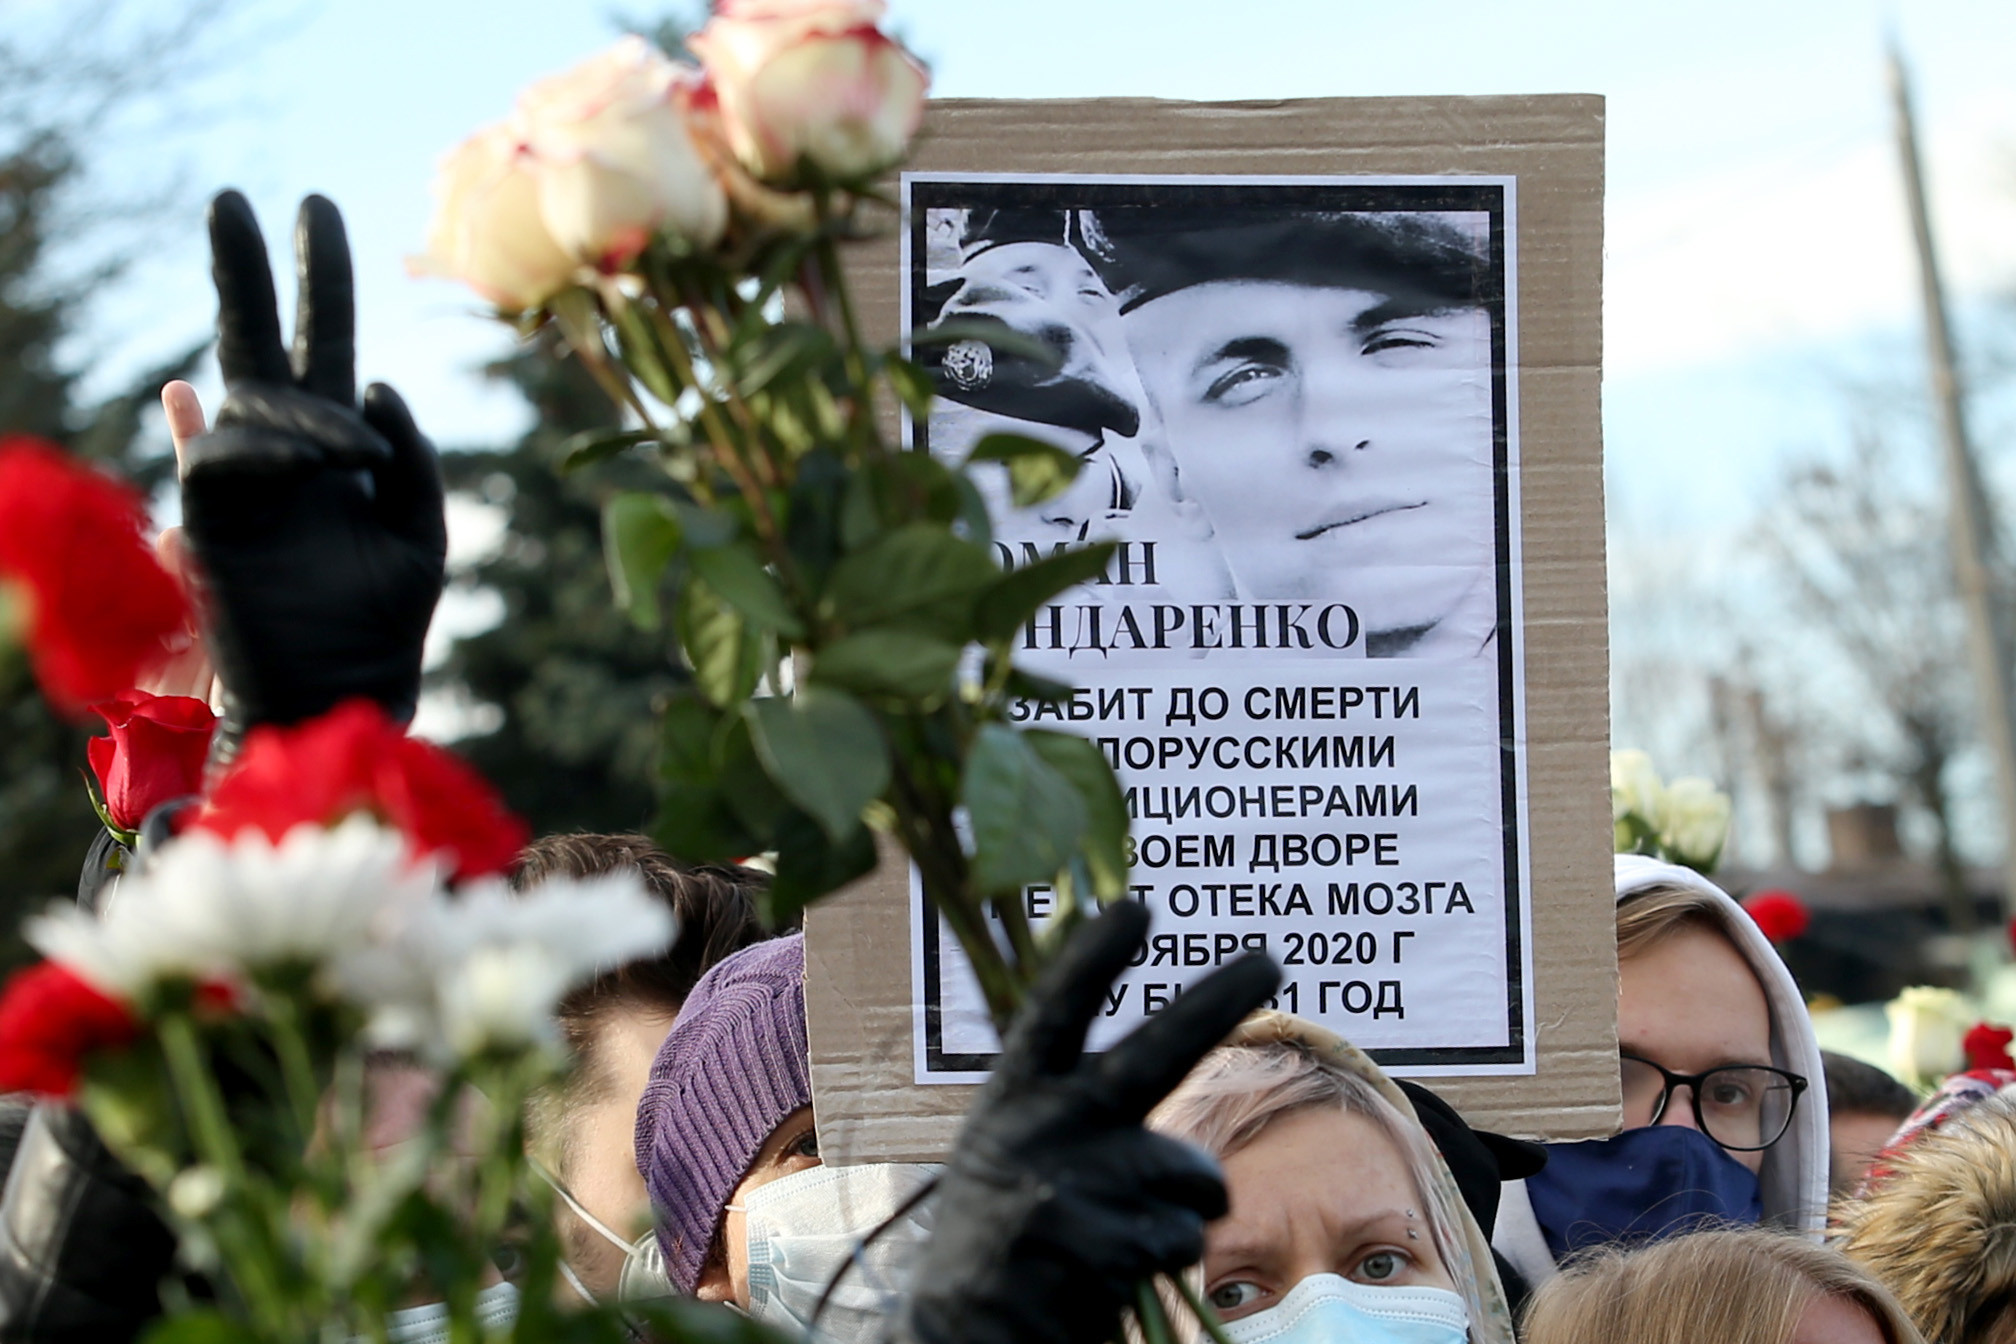 Belarus Ice Hockey Federation President Dmitri Baskov is accused of involvement in the murder of Raman Bandarenka ©Getty Images